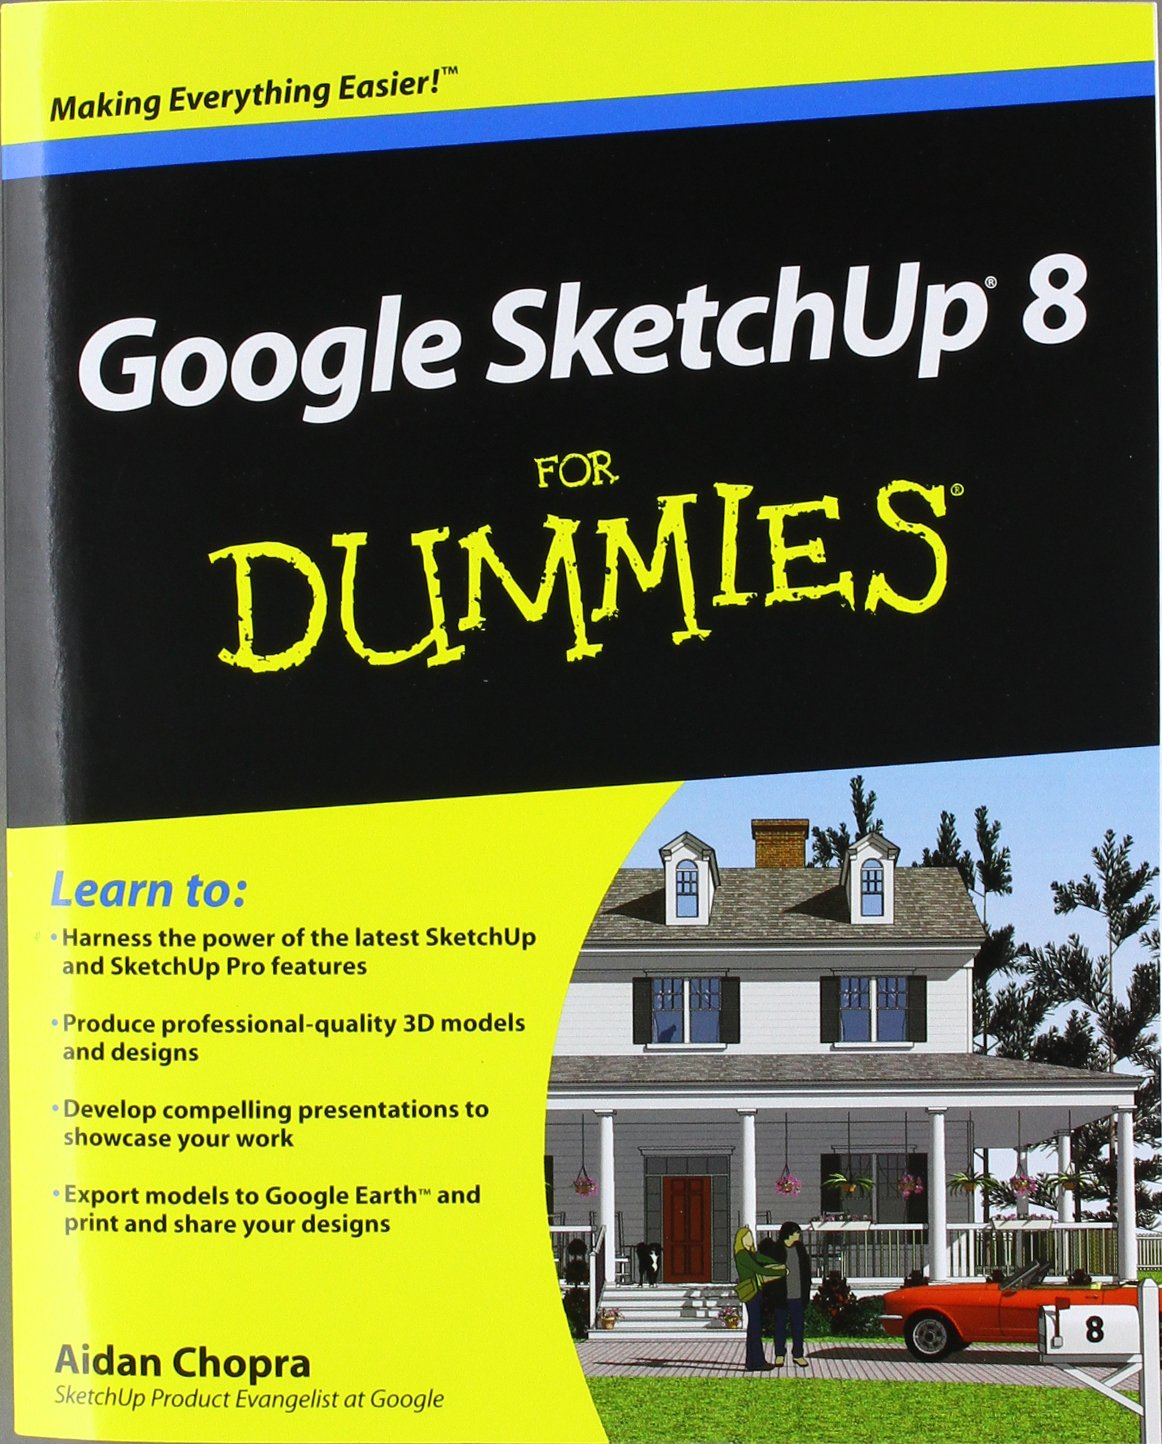 google sketchup 8 free online play